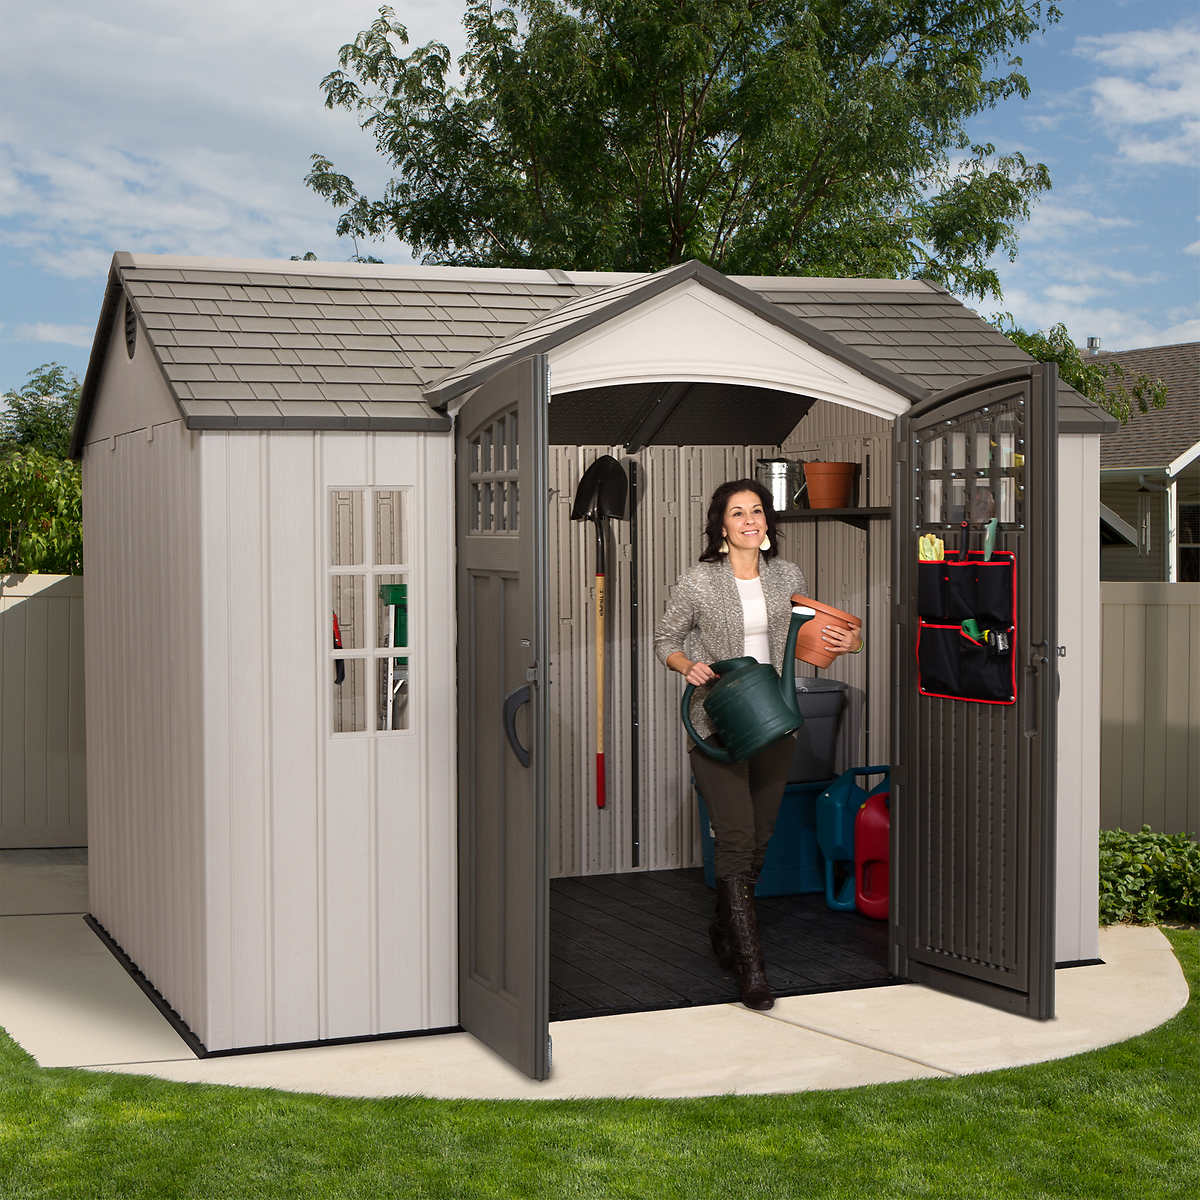 garden sheds edmonton installed